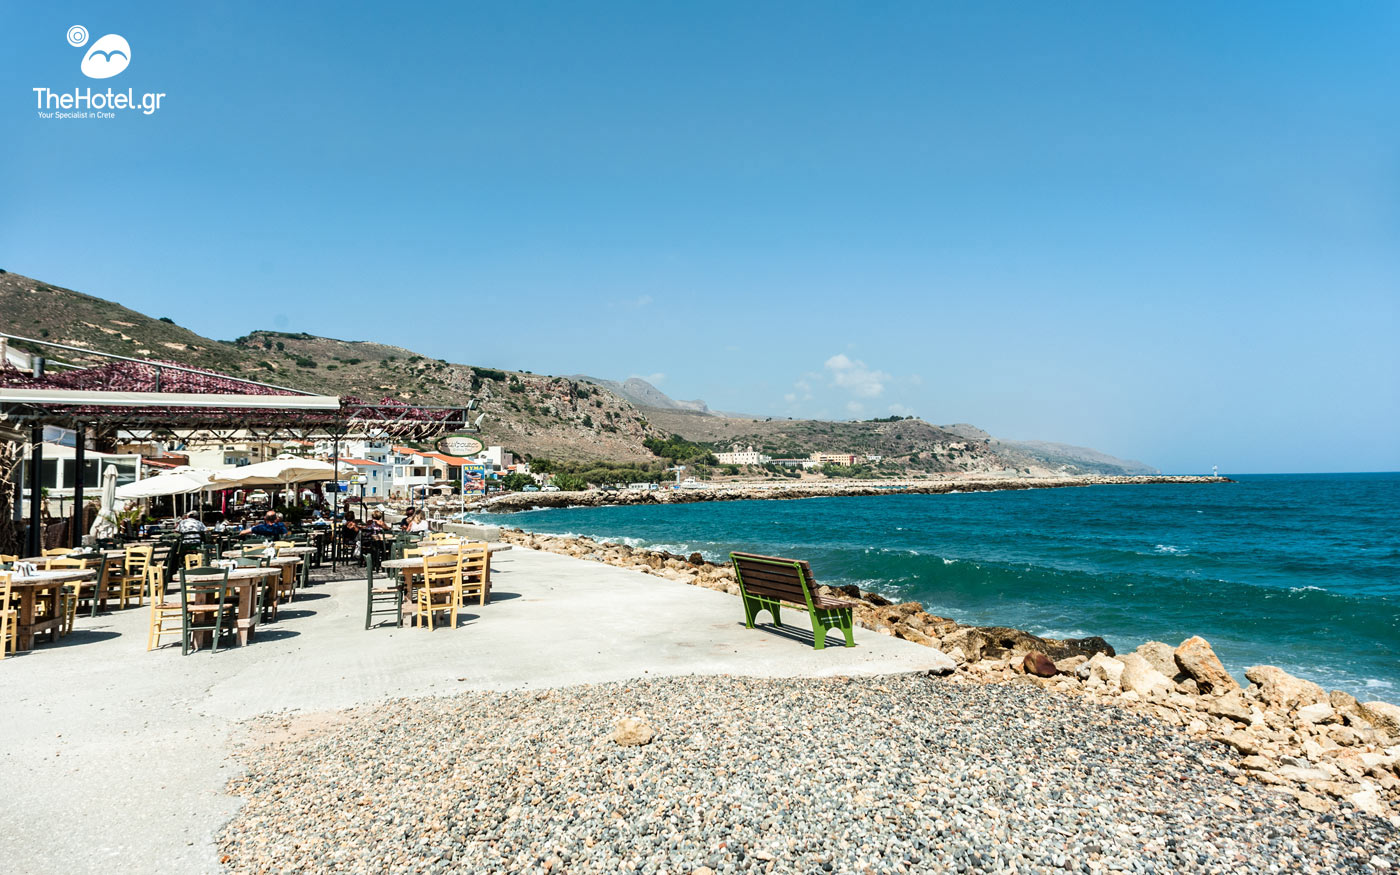 Kolymbari Villas And Hotels In Kolymbari Chania Crete